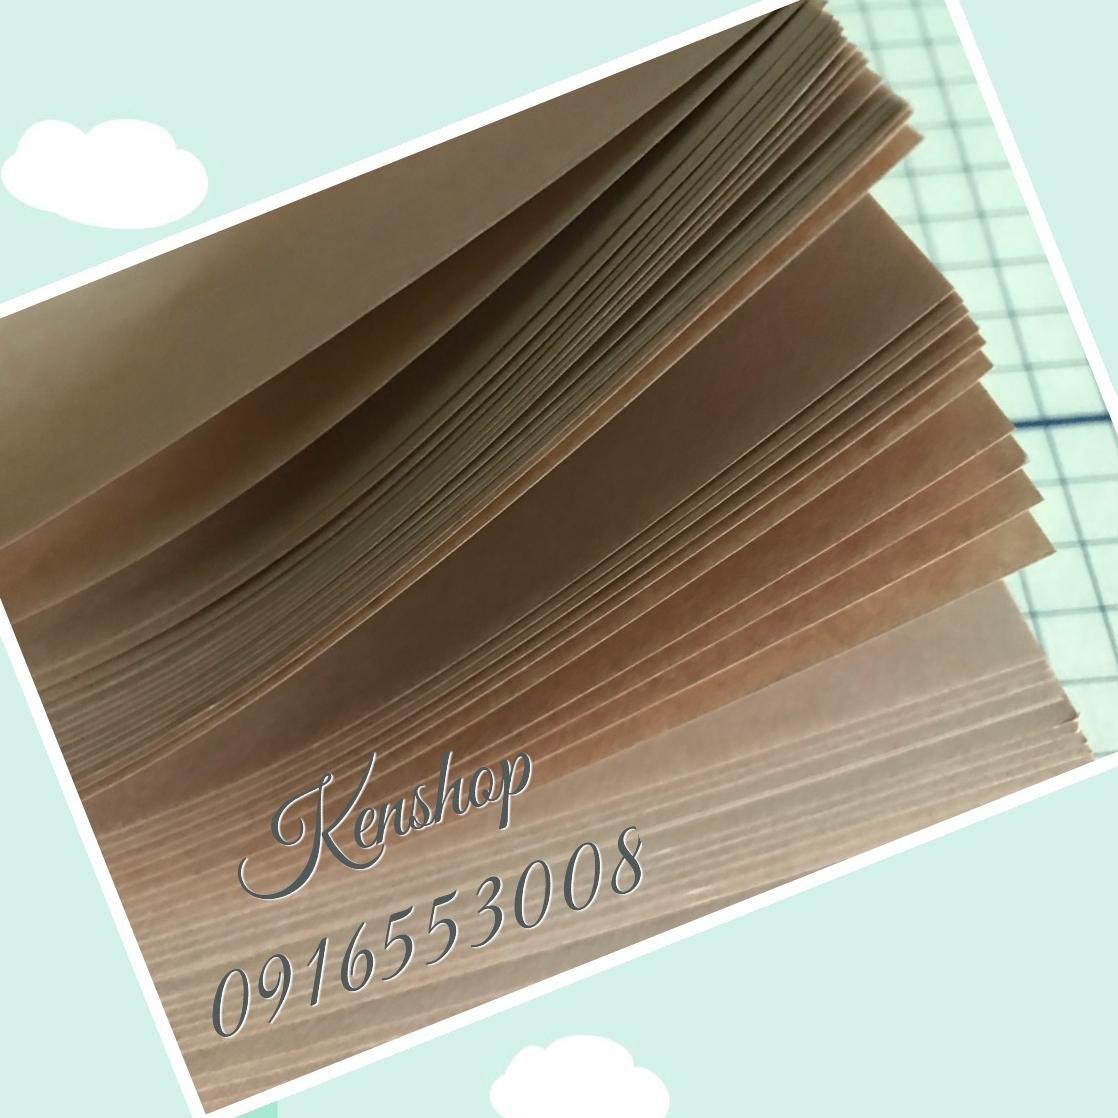 Mua 100 tờ giấy Kraft kt 25x35 70gsm